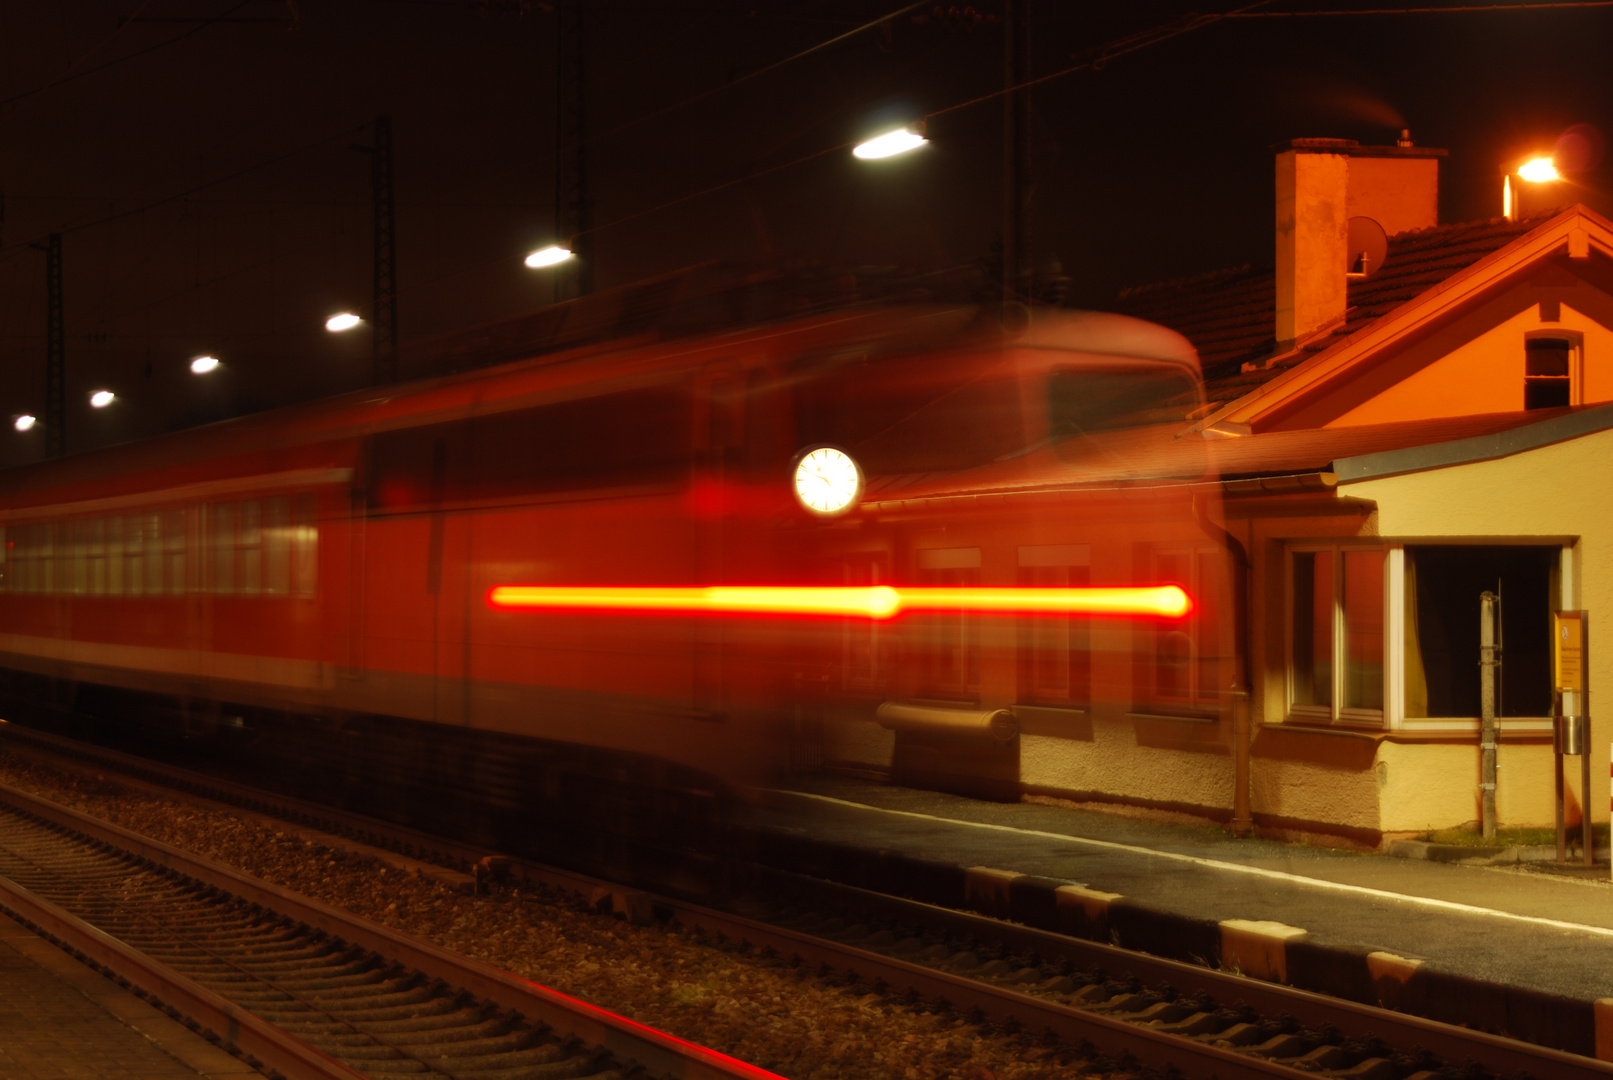 Bahnhof Gablingen bei Nacht Bild 3